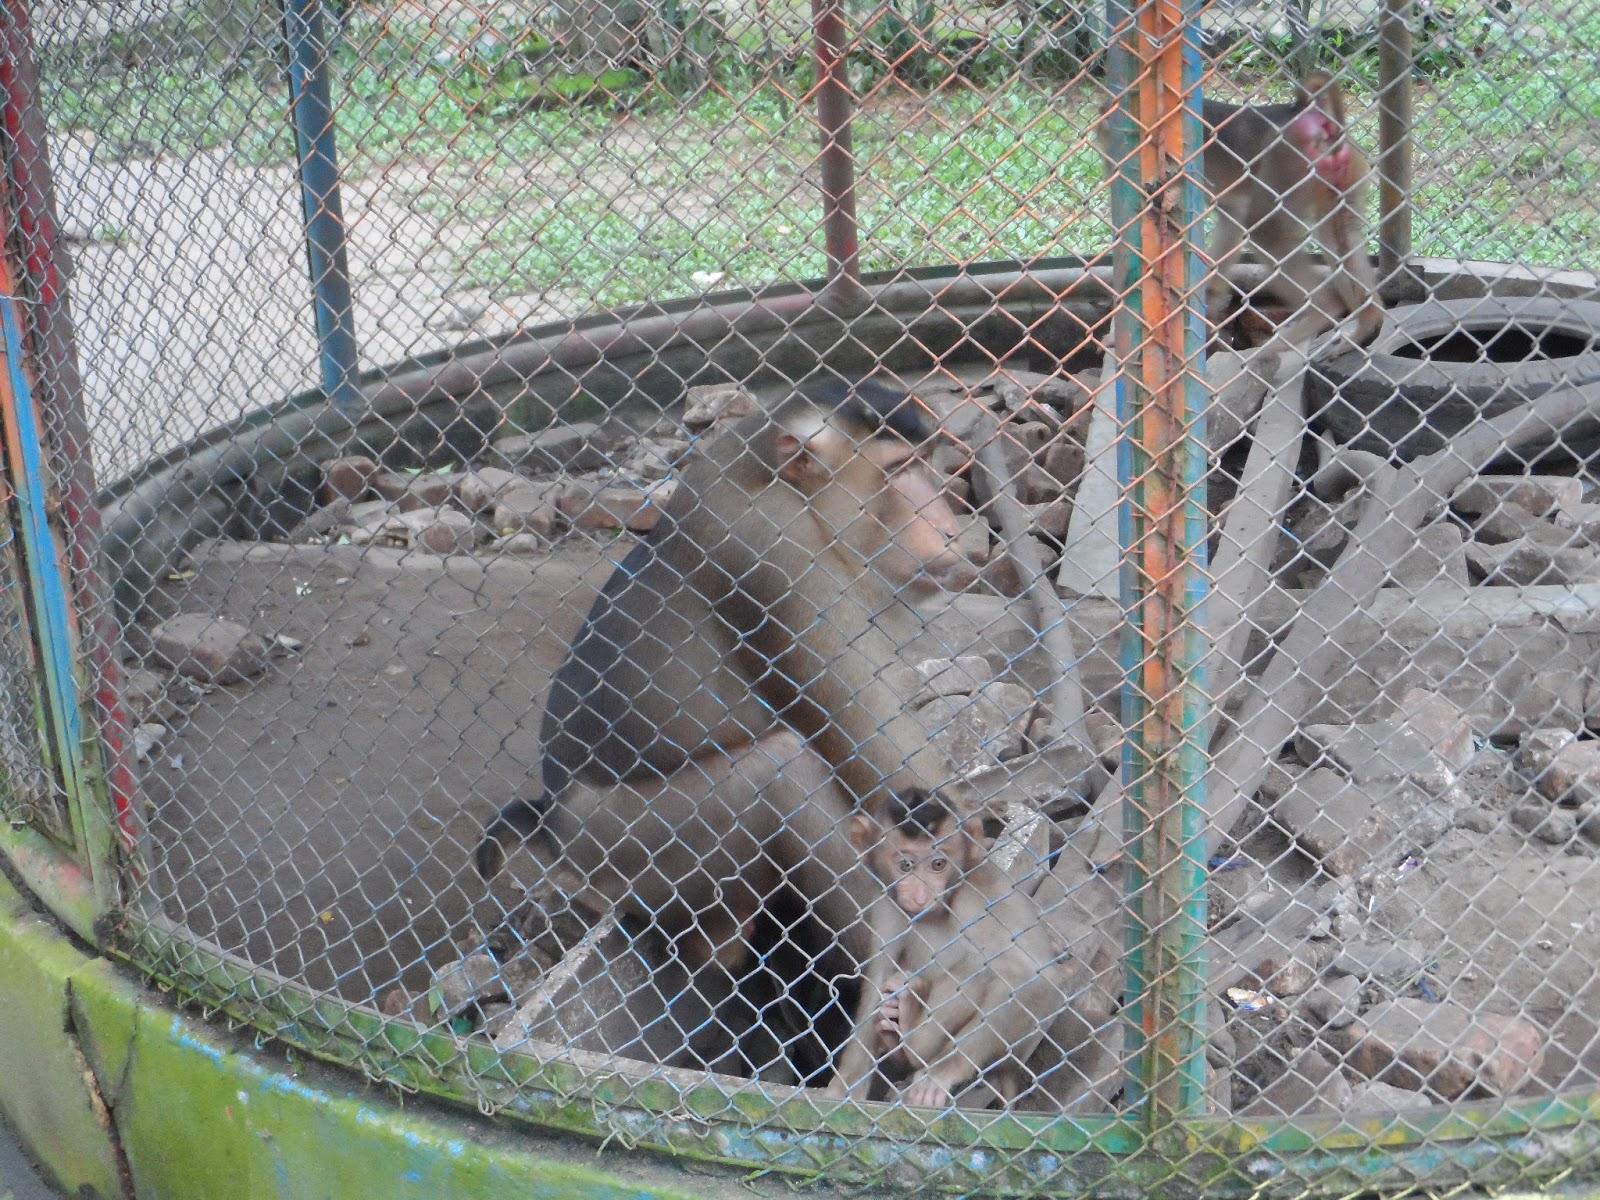 Qolbi Qutbi Hutan Wisata Punti Kayu Palembang Tiket Masuk Waterboom